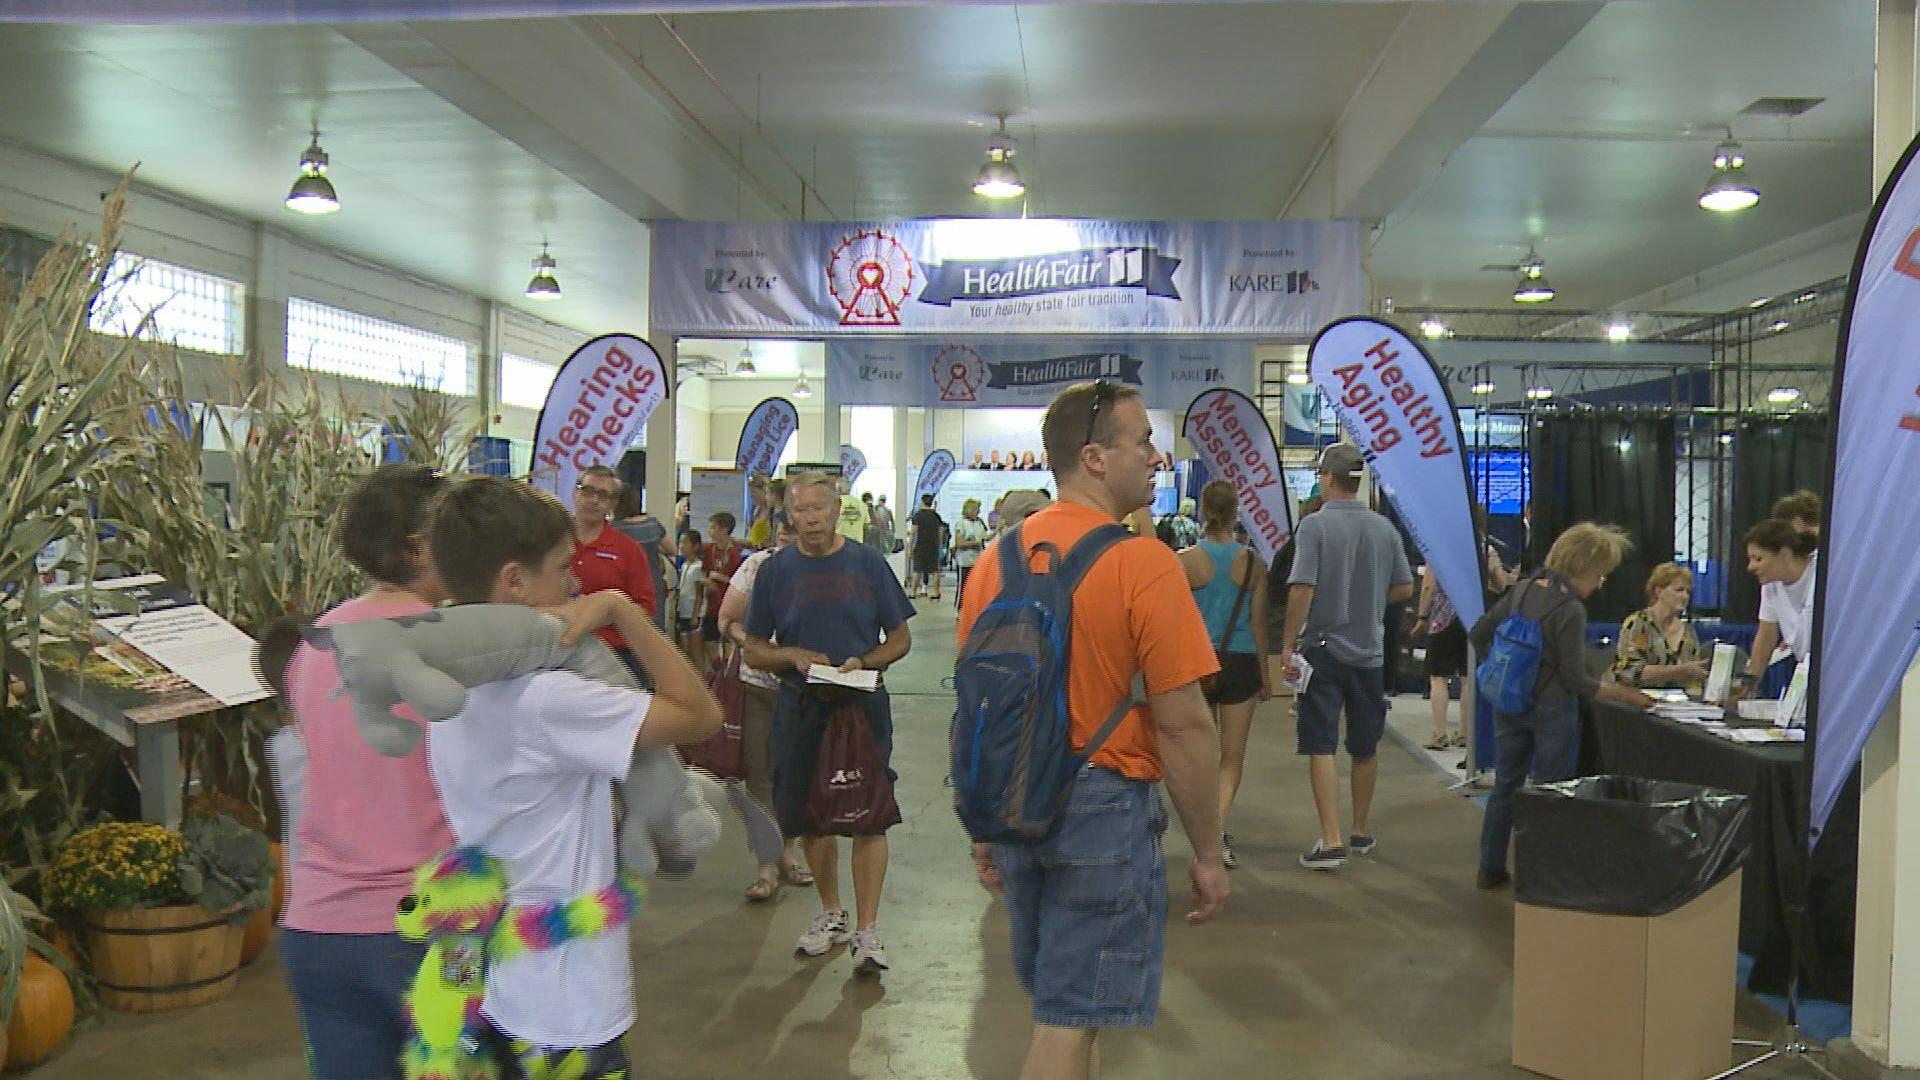 Health Fair 11 at the Fair celebrates 1 million screenings